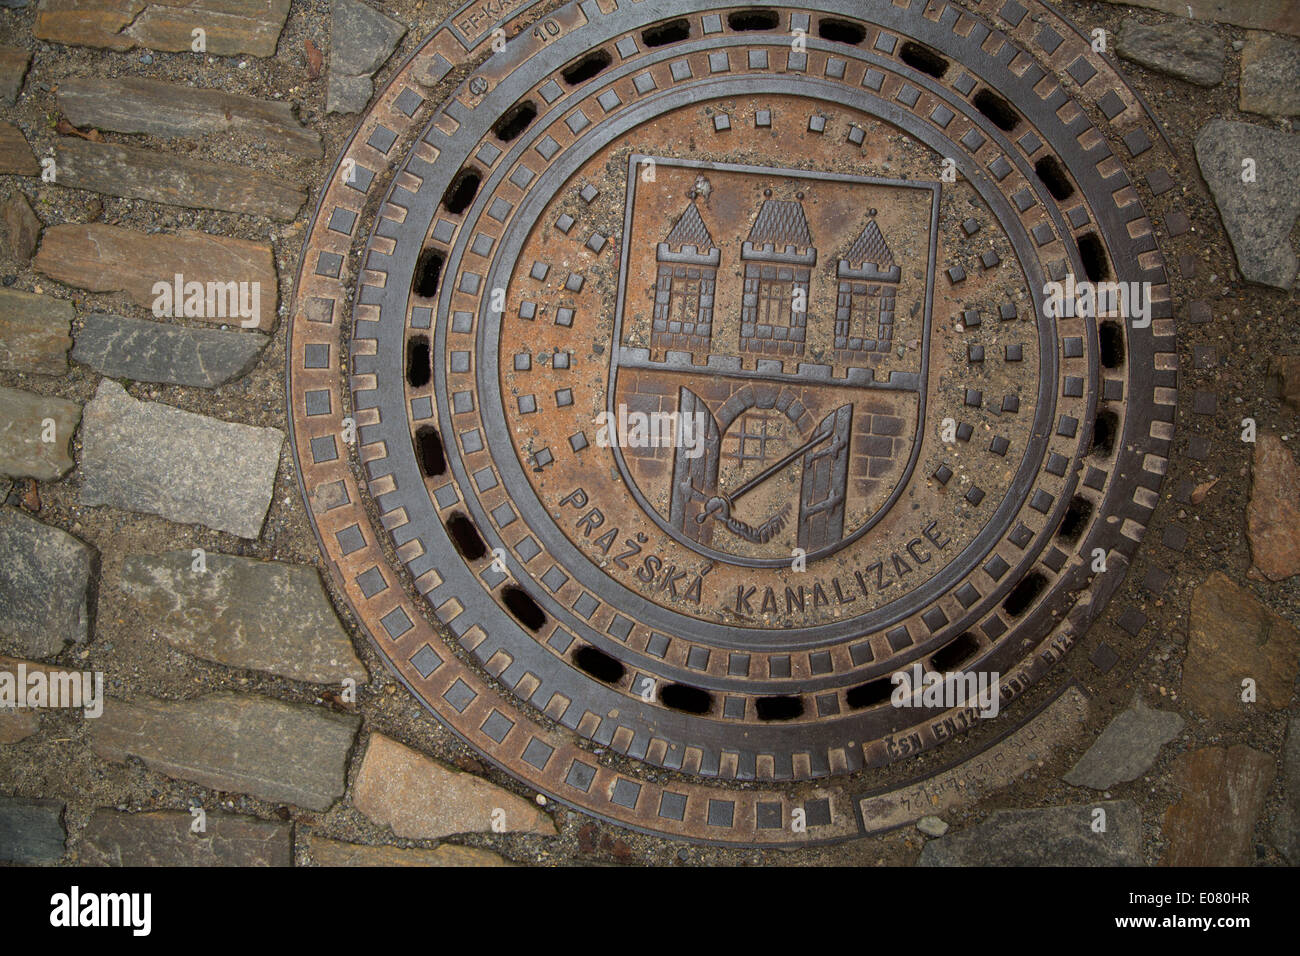 Prague, Czech Republic manhole. - Stock Image